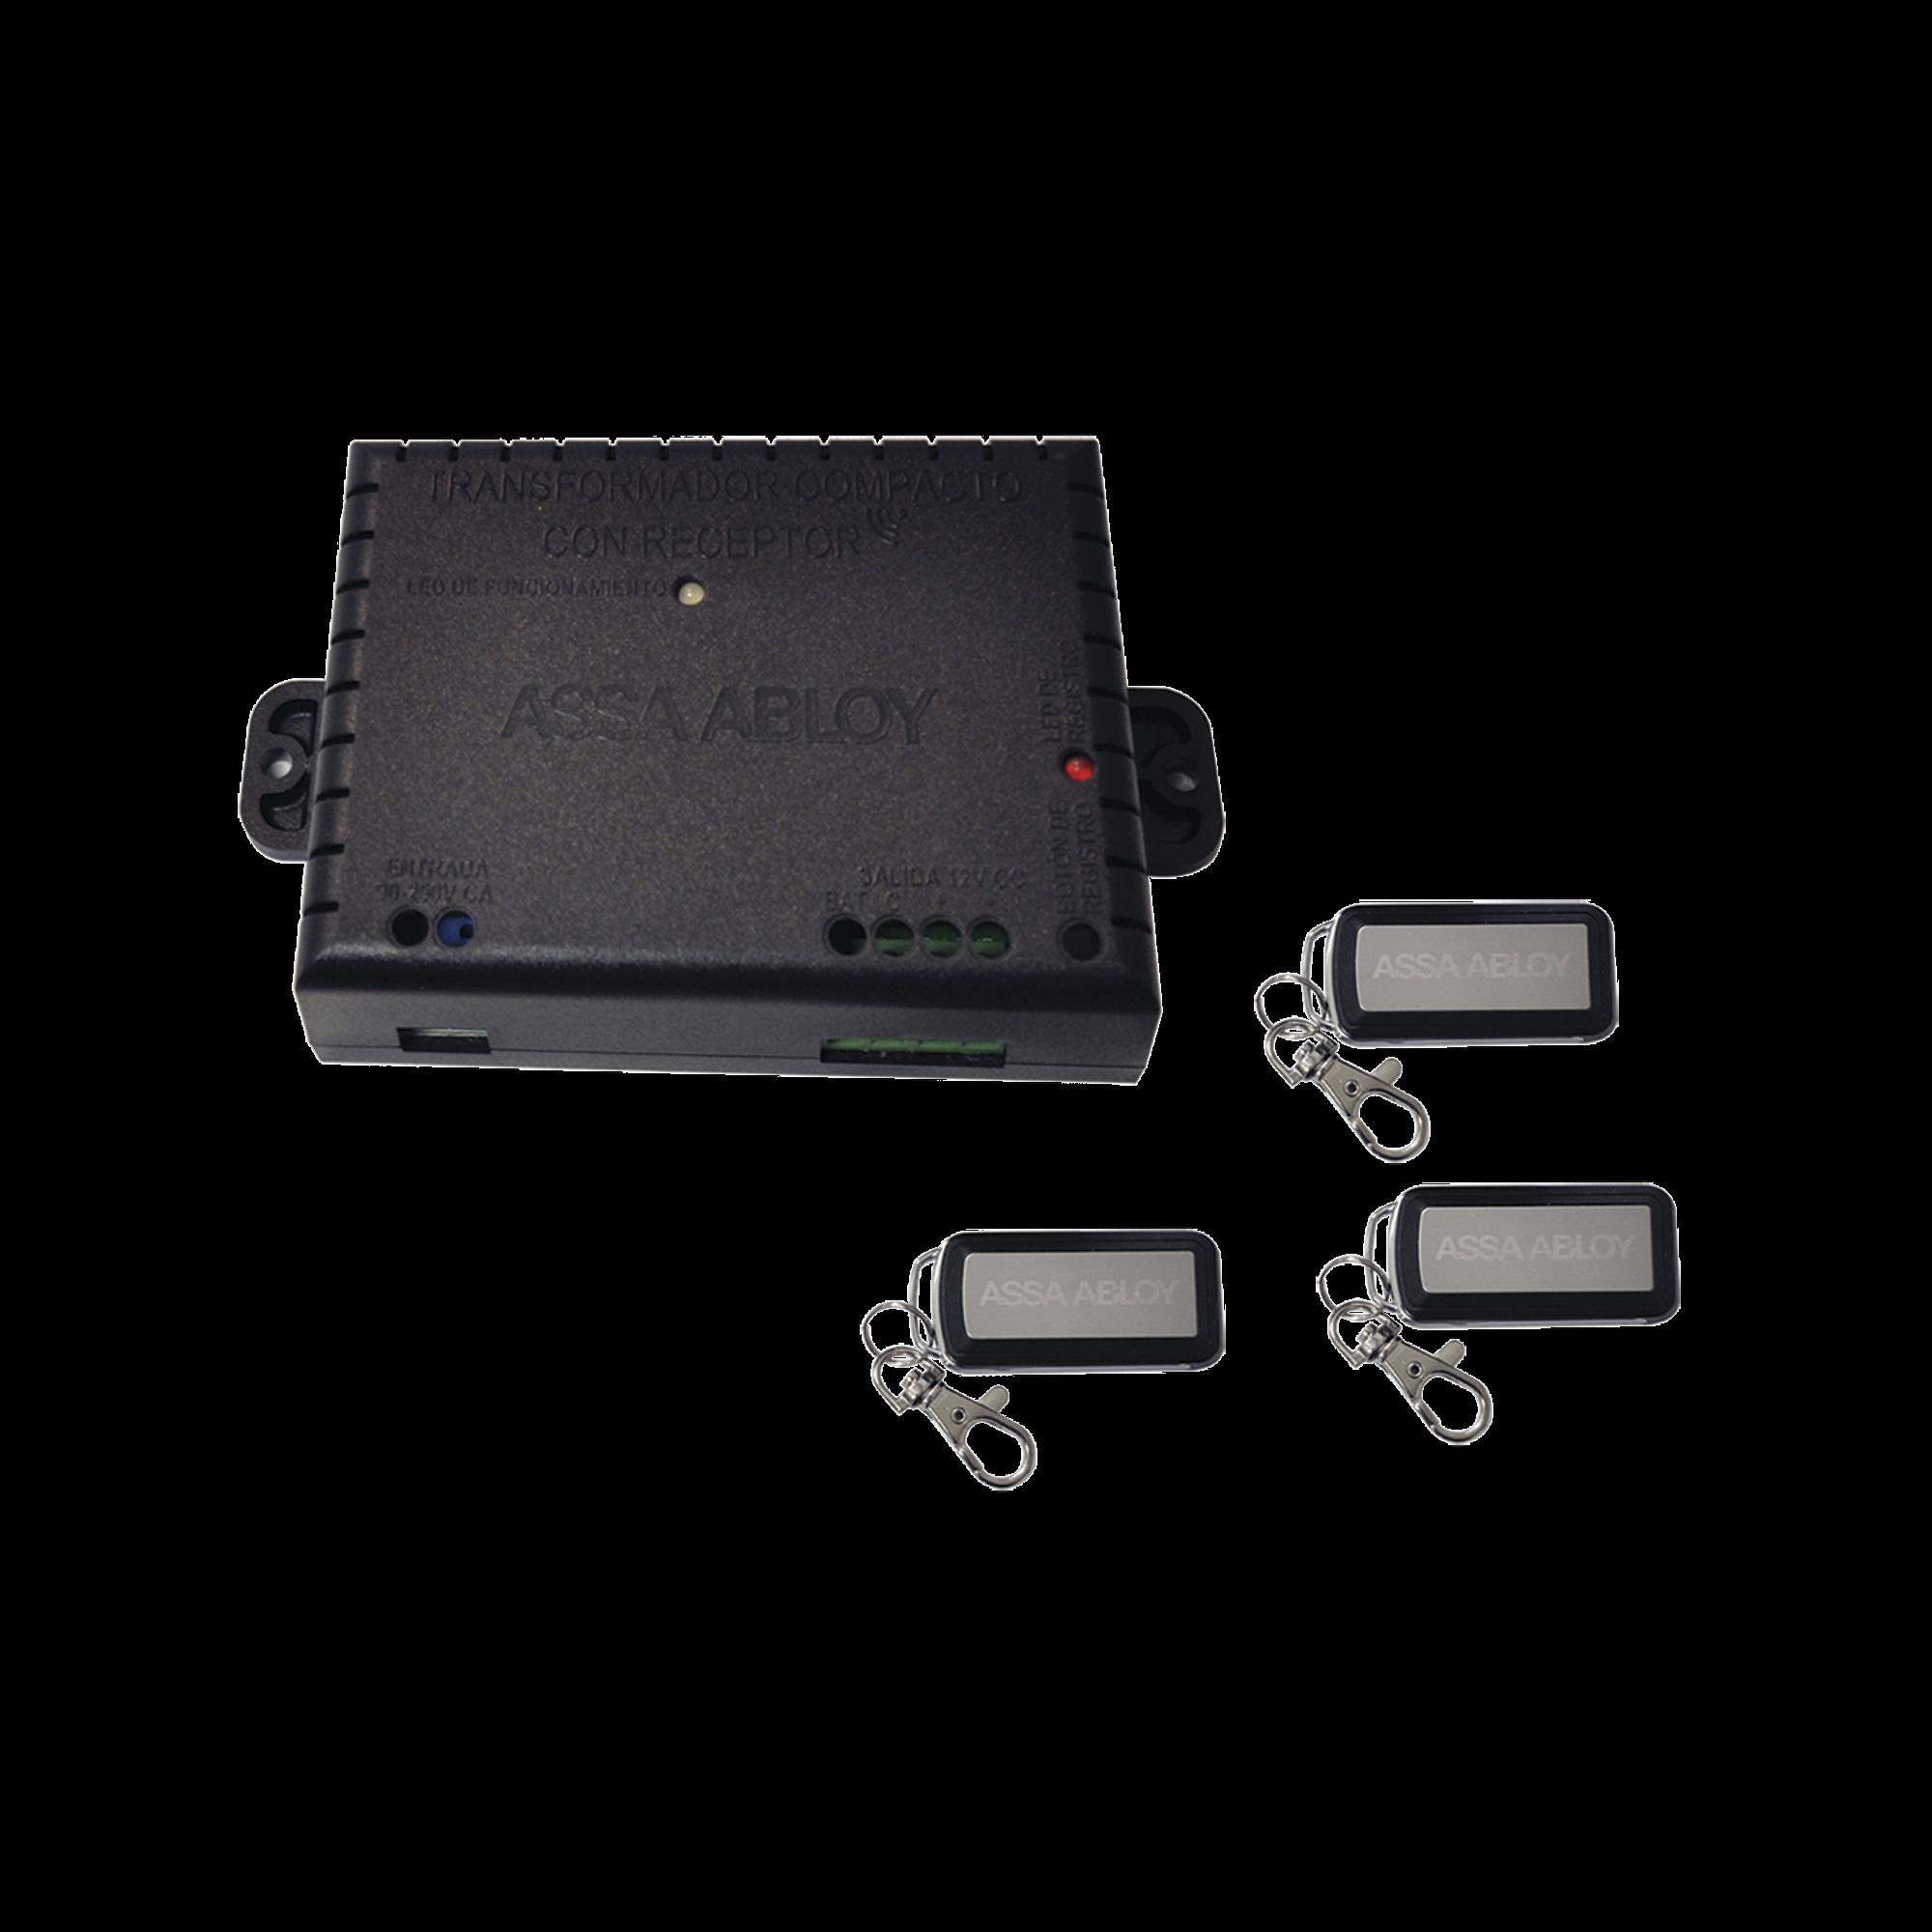 Kit de Receptor Assabloy con 3 controles